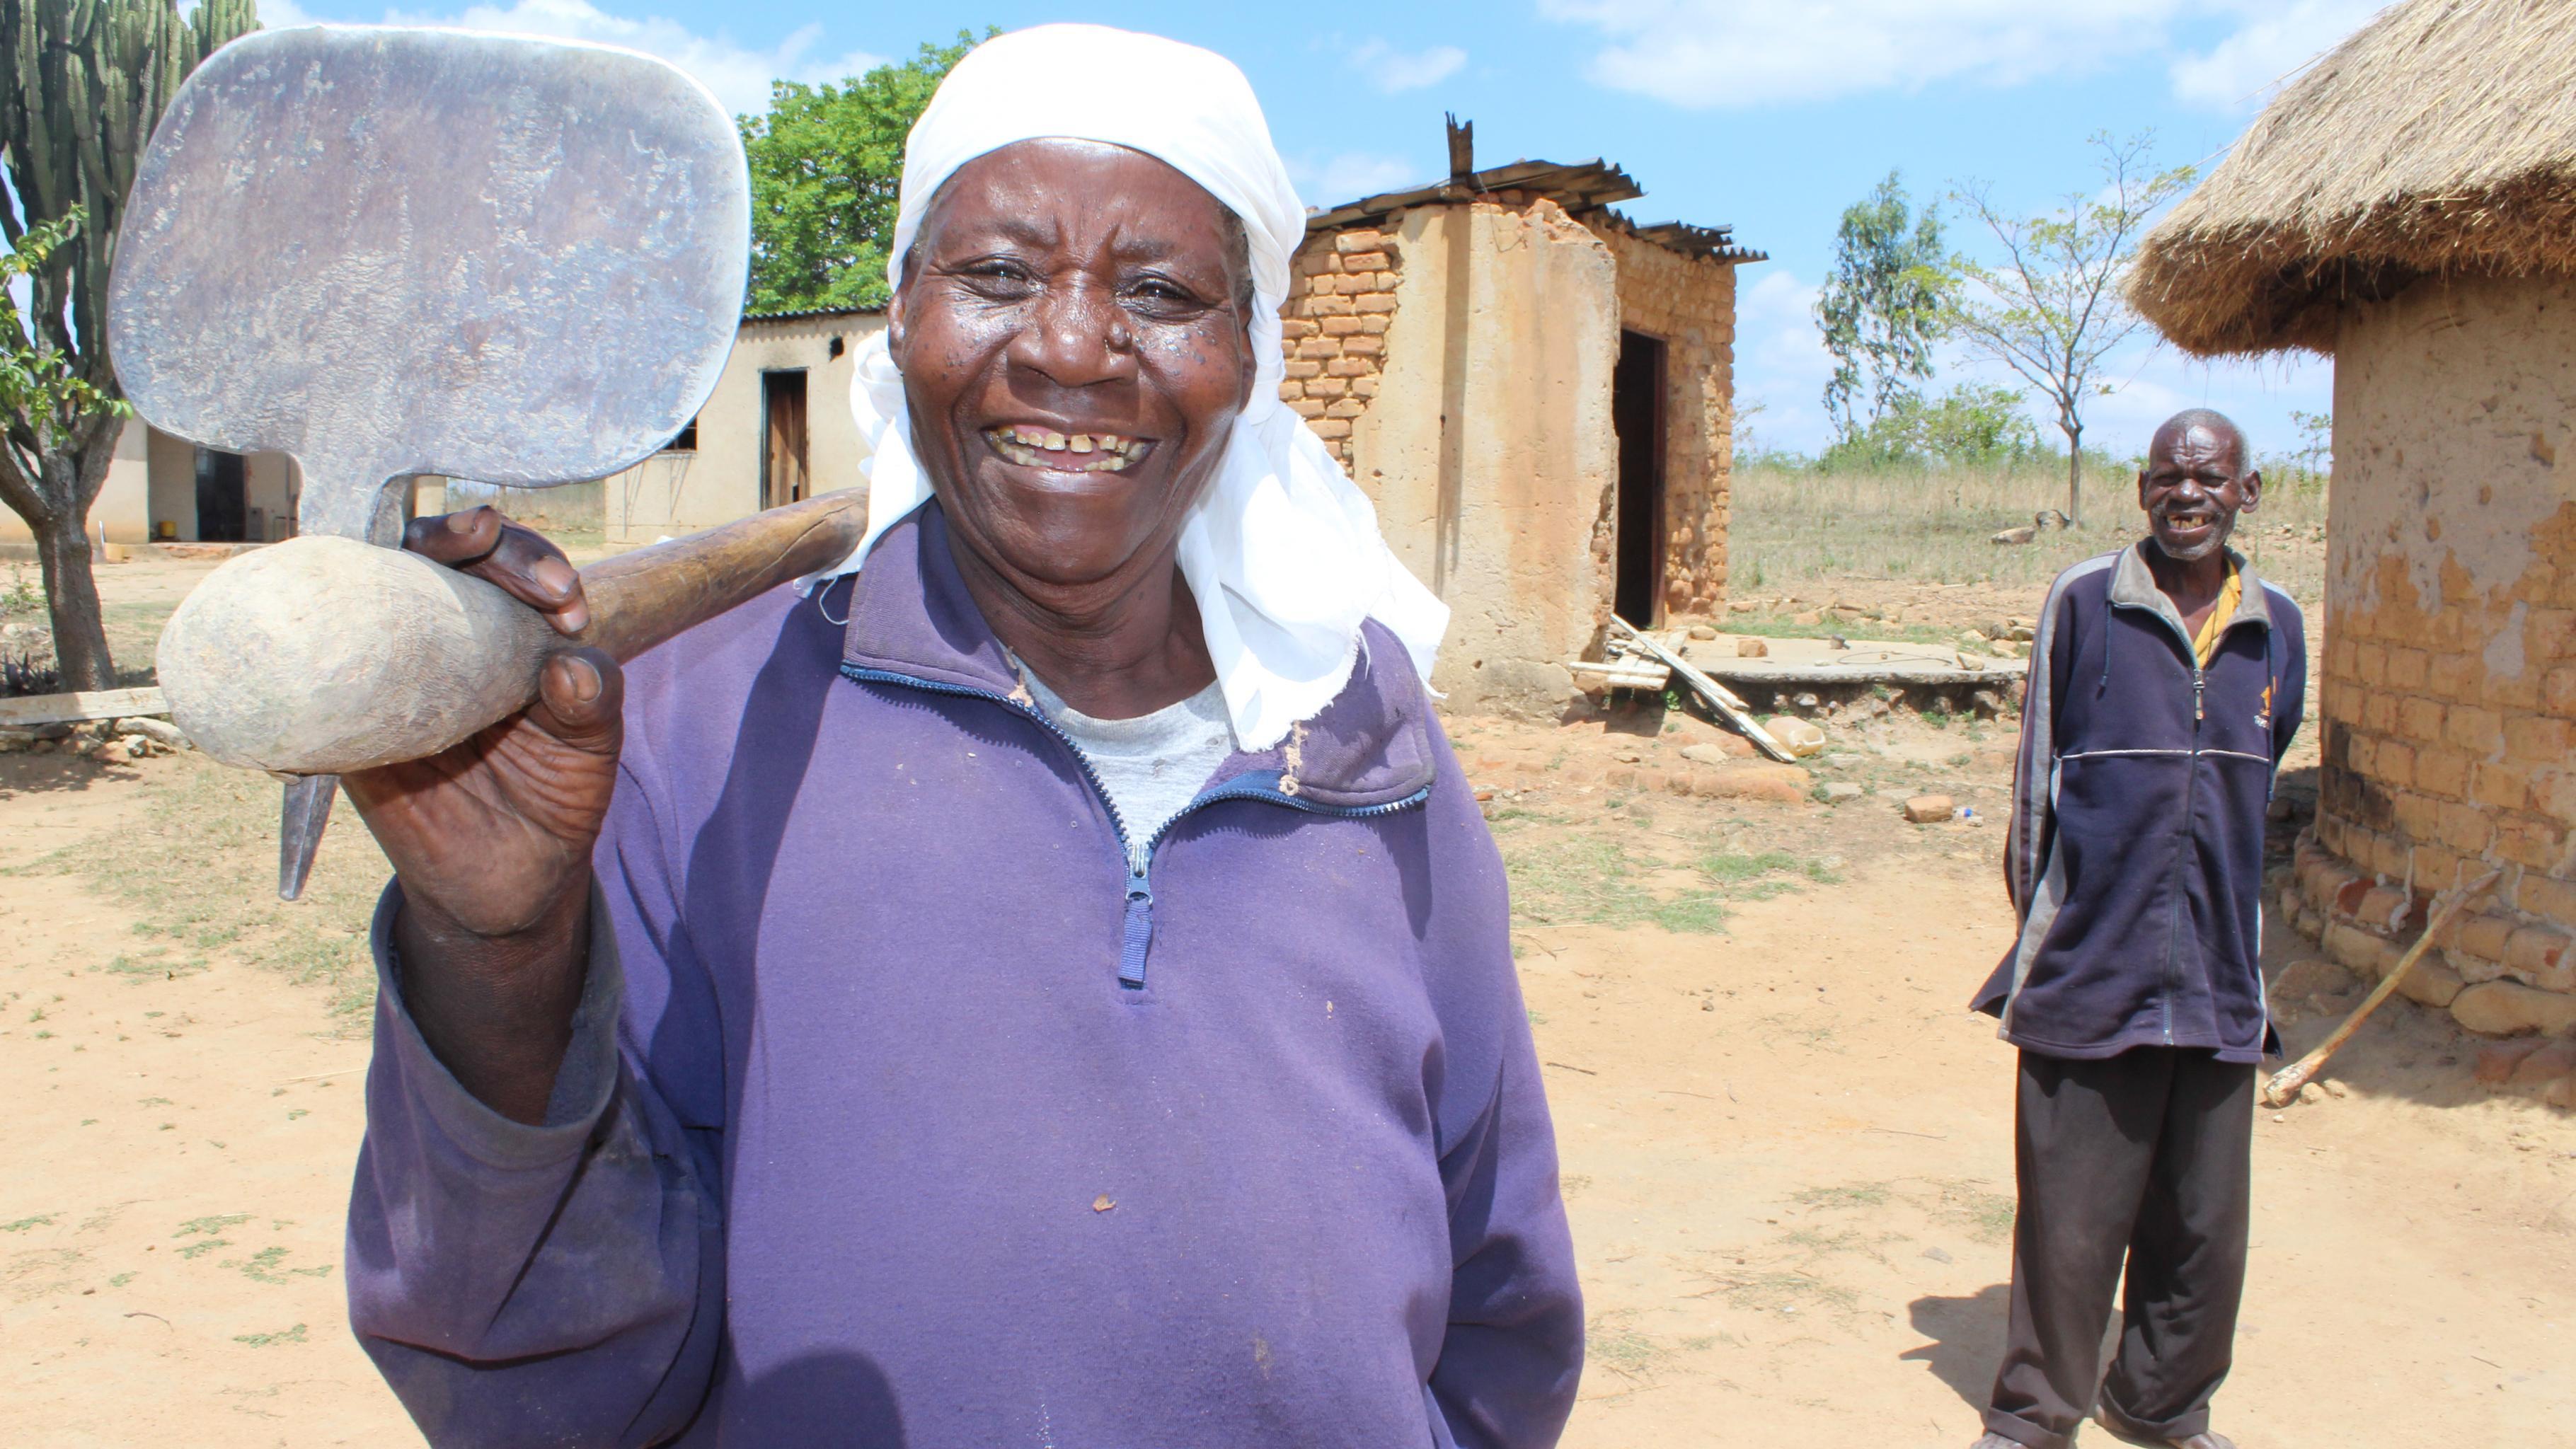 Die 71-jährige Florence Mahove aus Simbabwe mit ihrem Ehemann